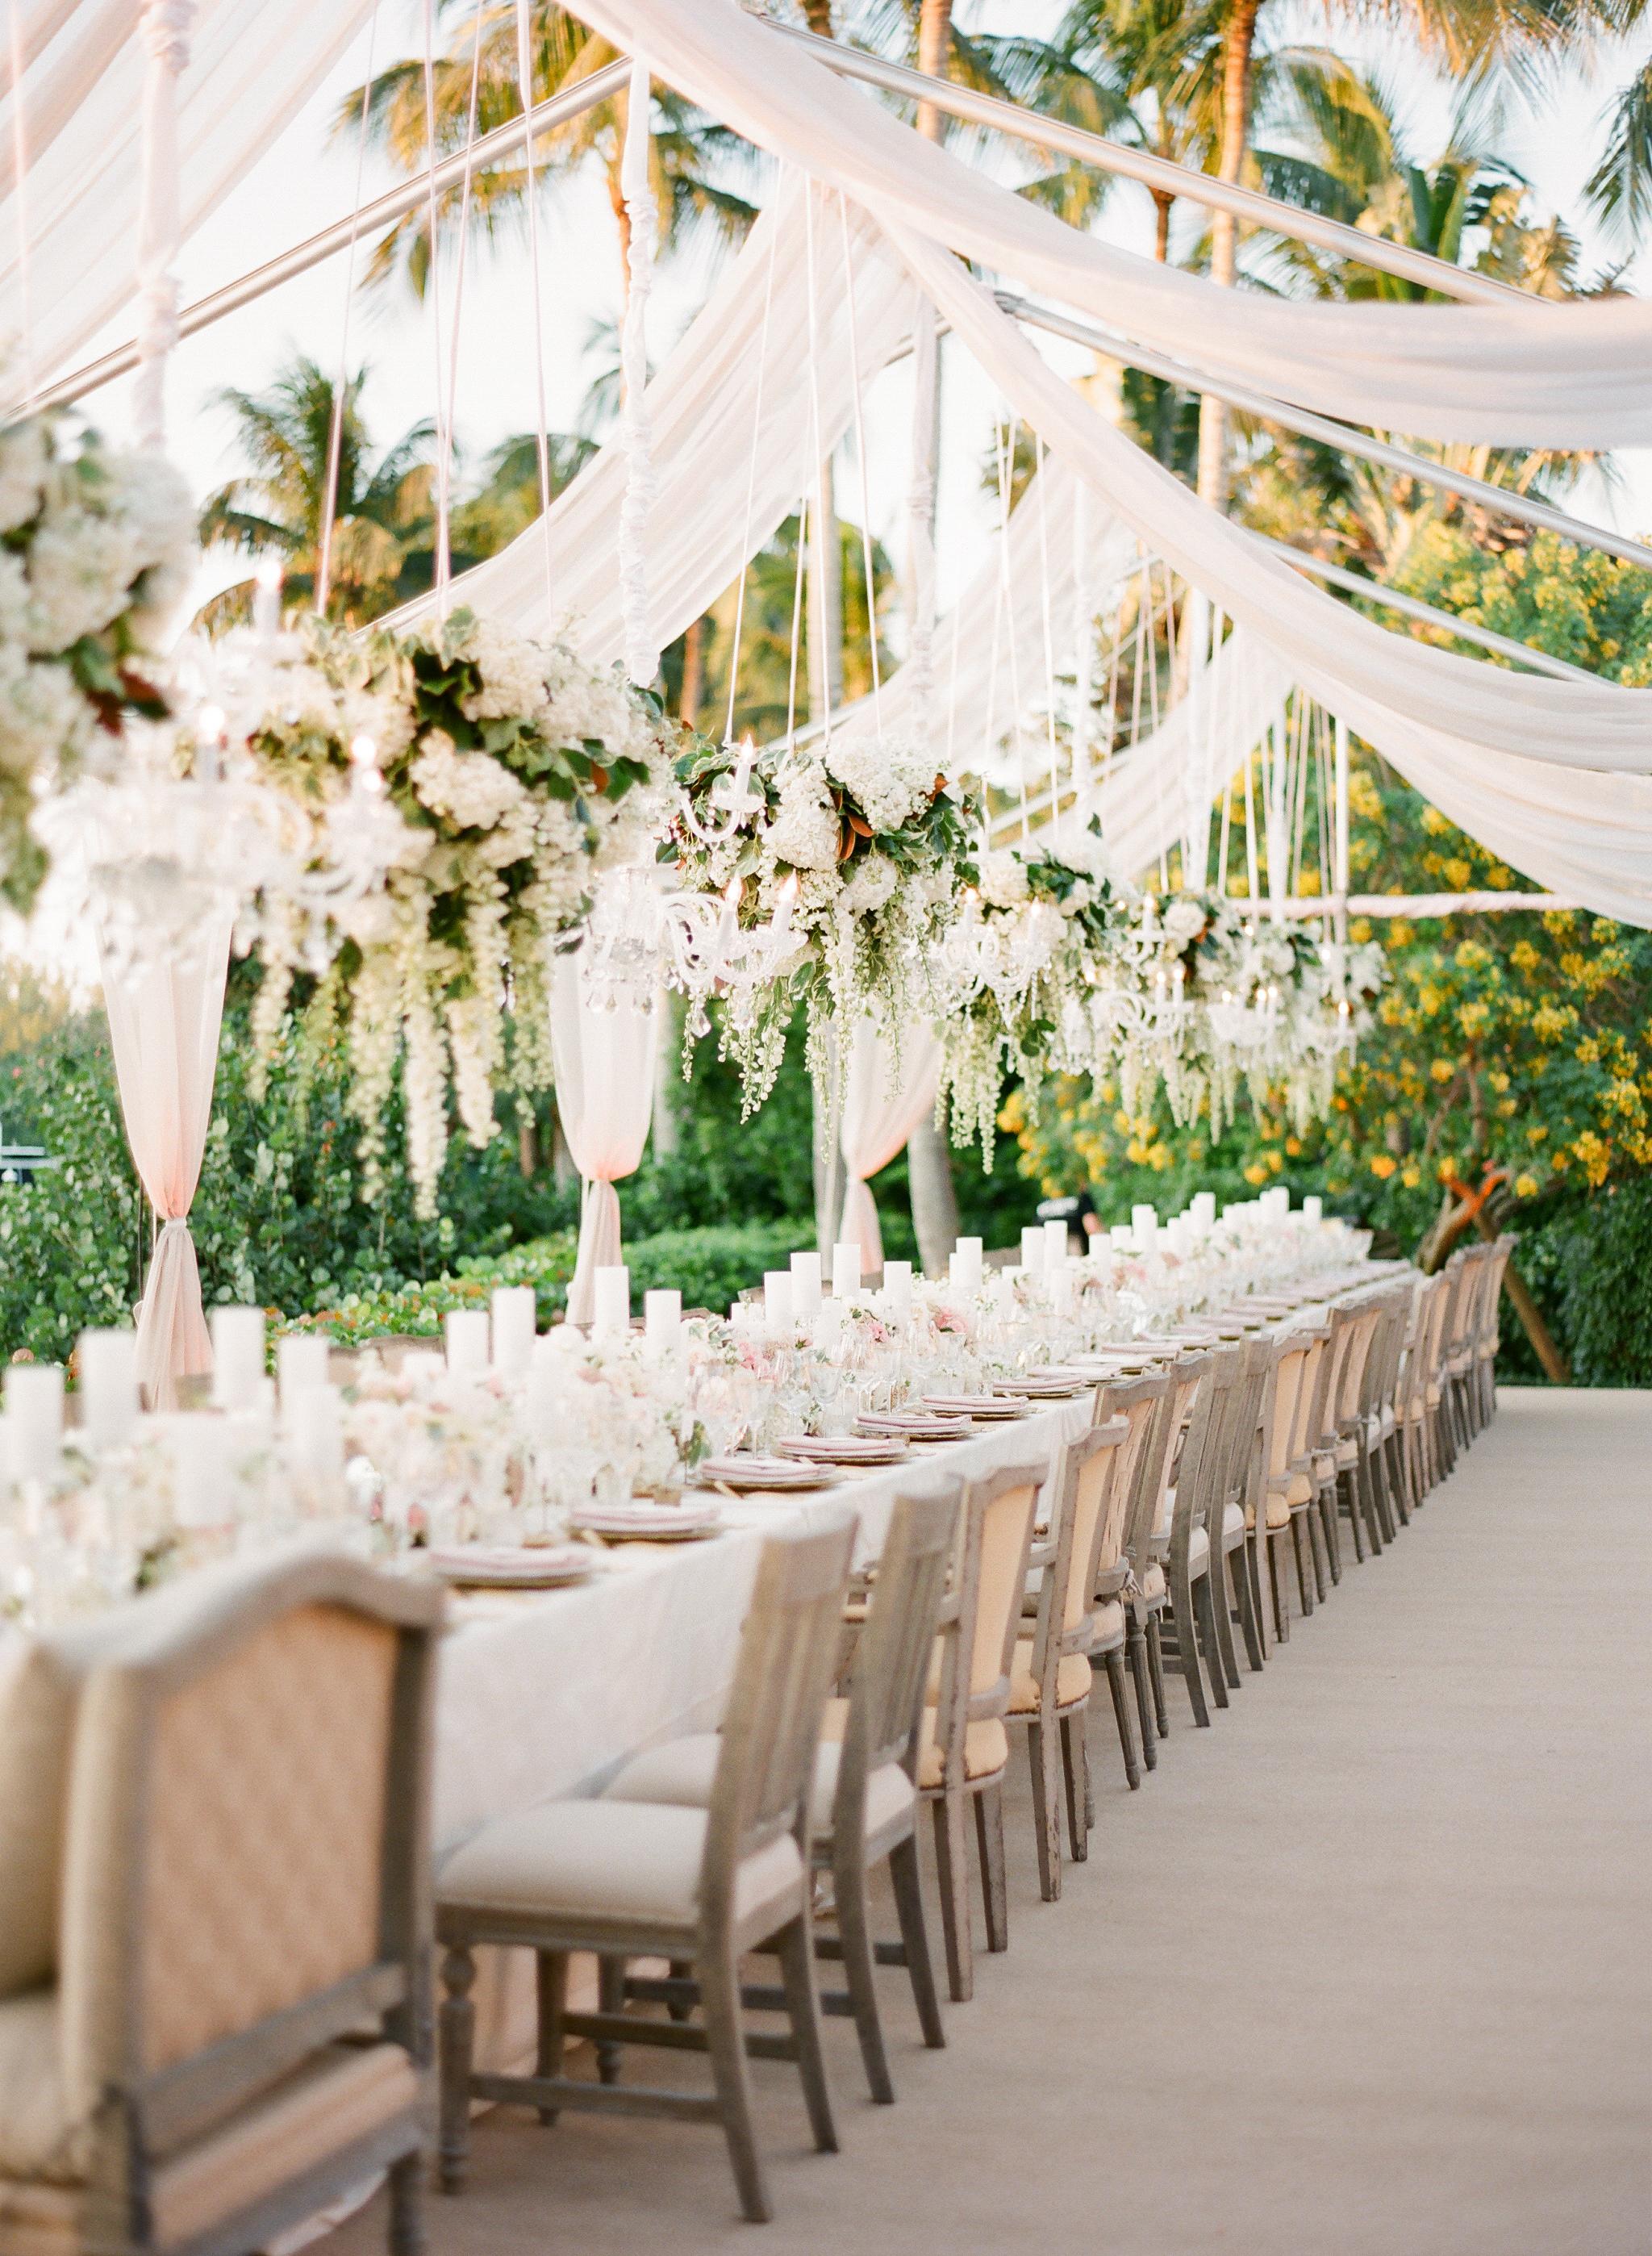 Ceci_New_York_Florida_Wedding_Style_Bride_Watercolor_Real_Custom_Luxury_14.jpg